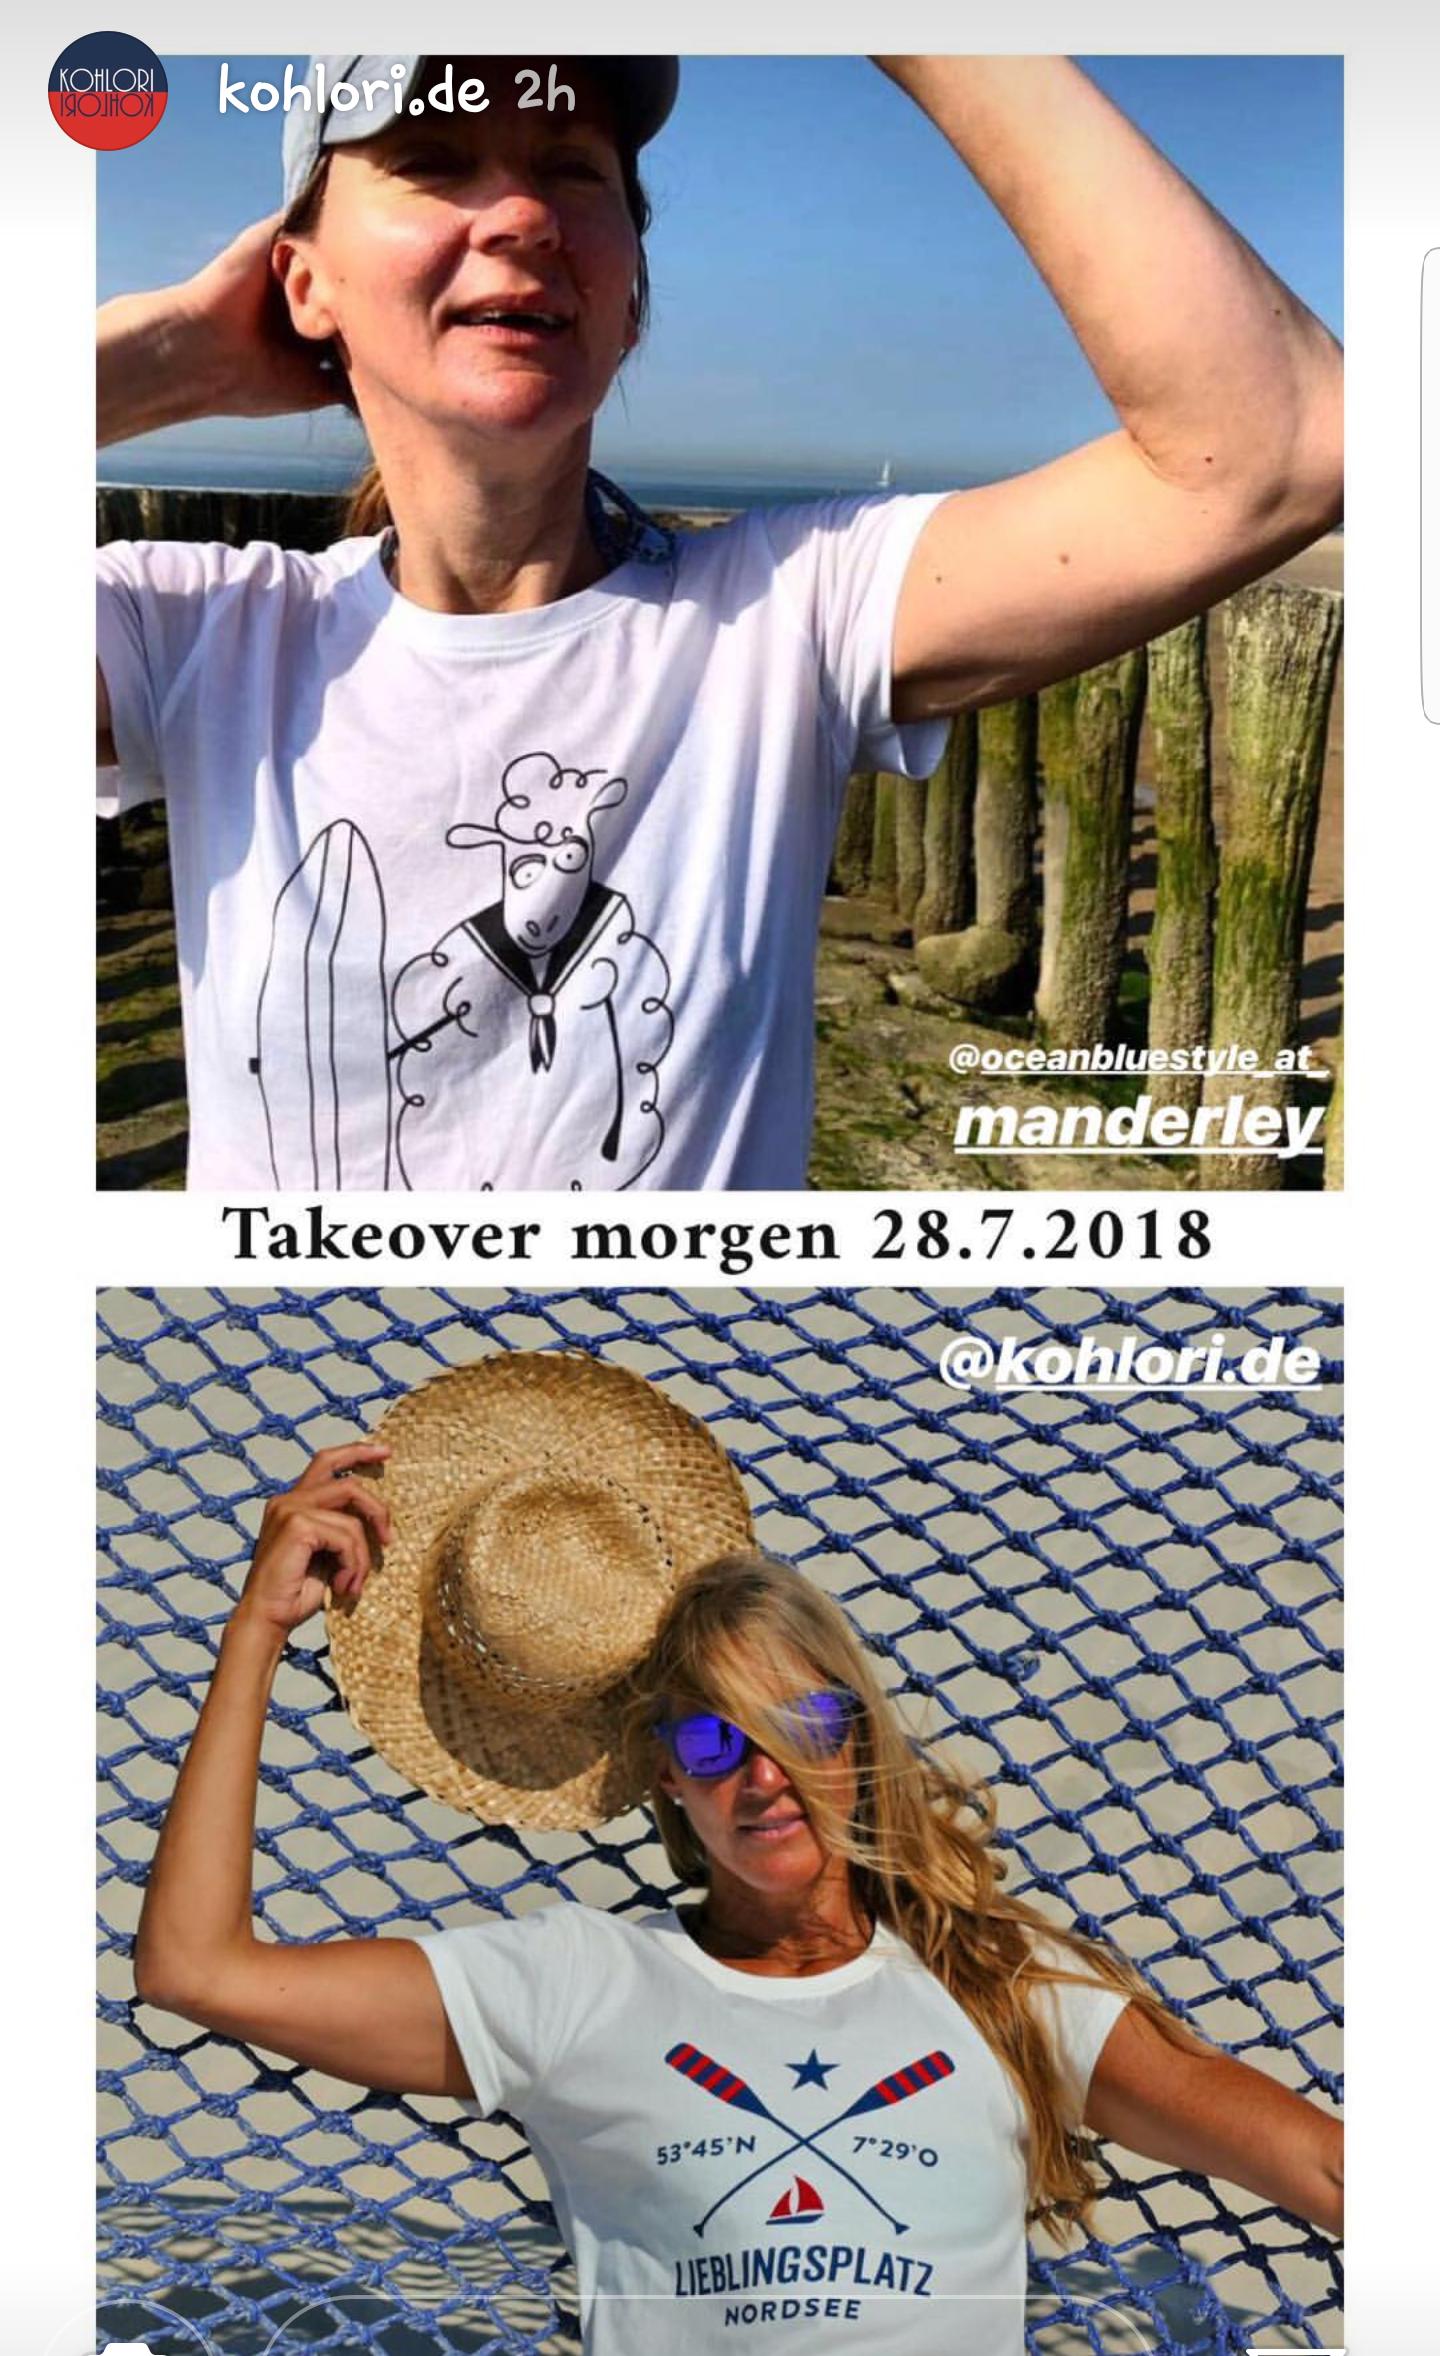 instagram-takeover_social-media-tipps_erfolgreich-bloggen_influencer-ue50_blog-frankfurt_oceanblue-style (2)